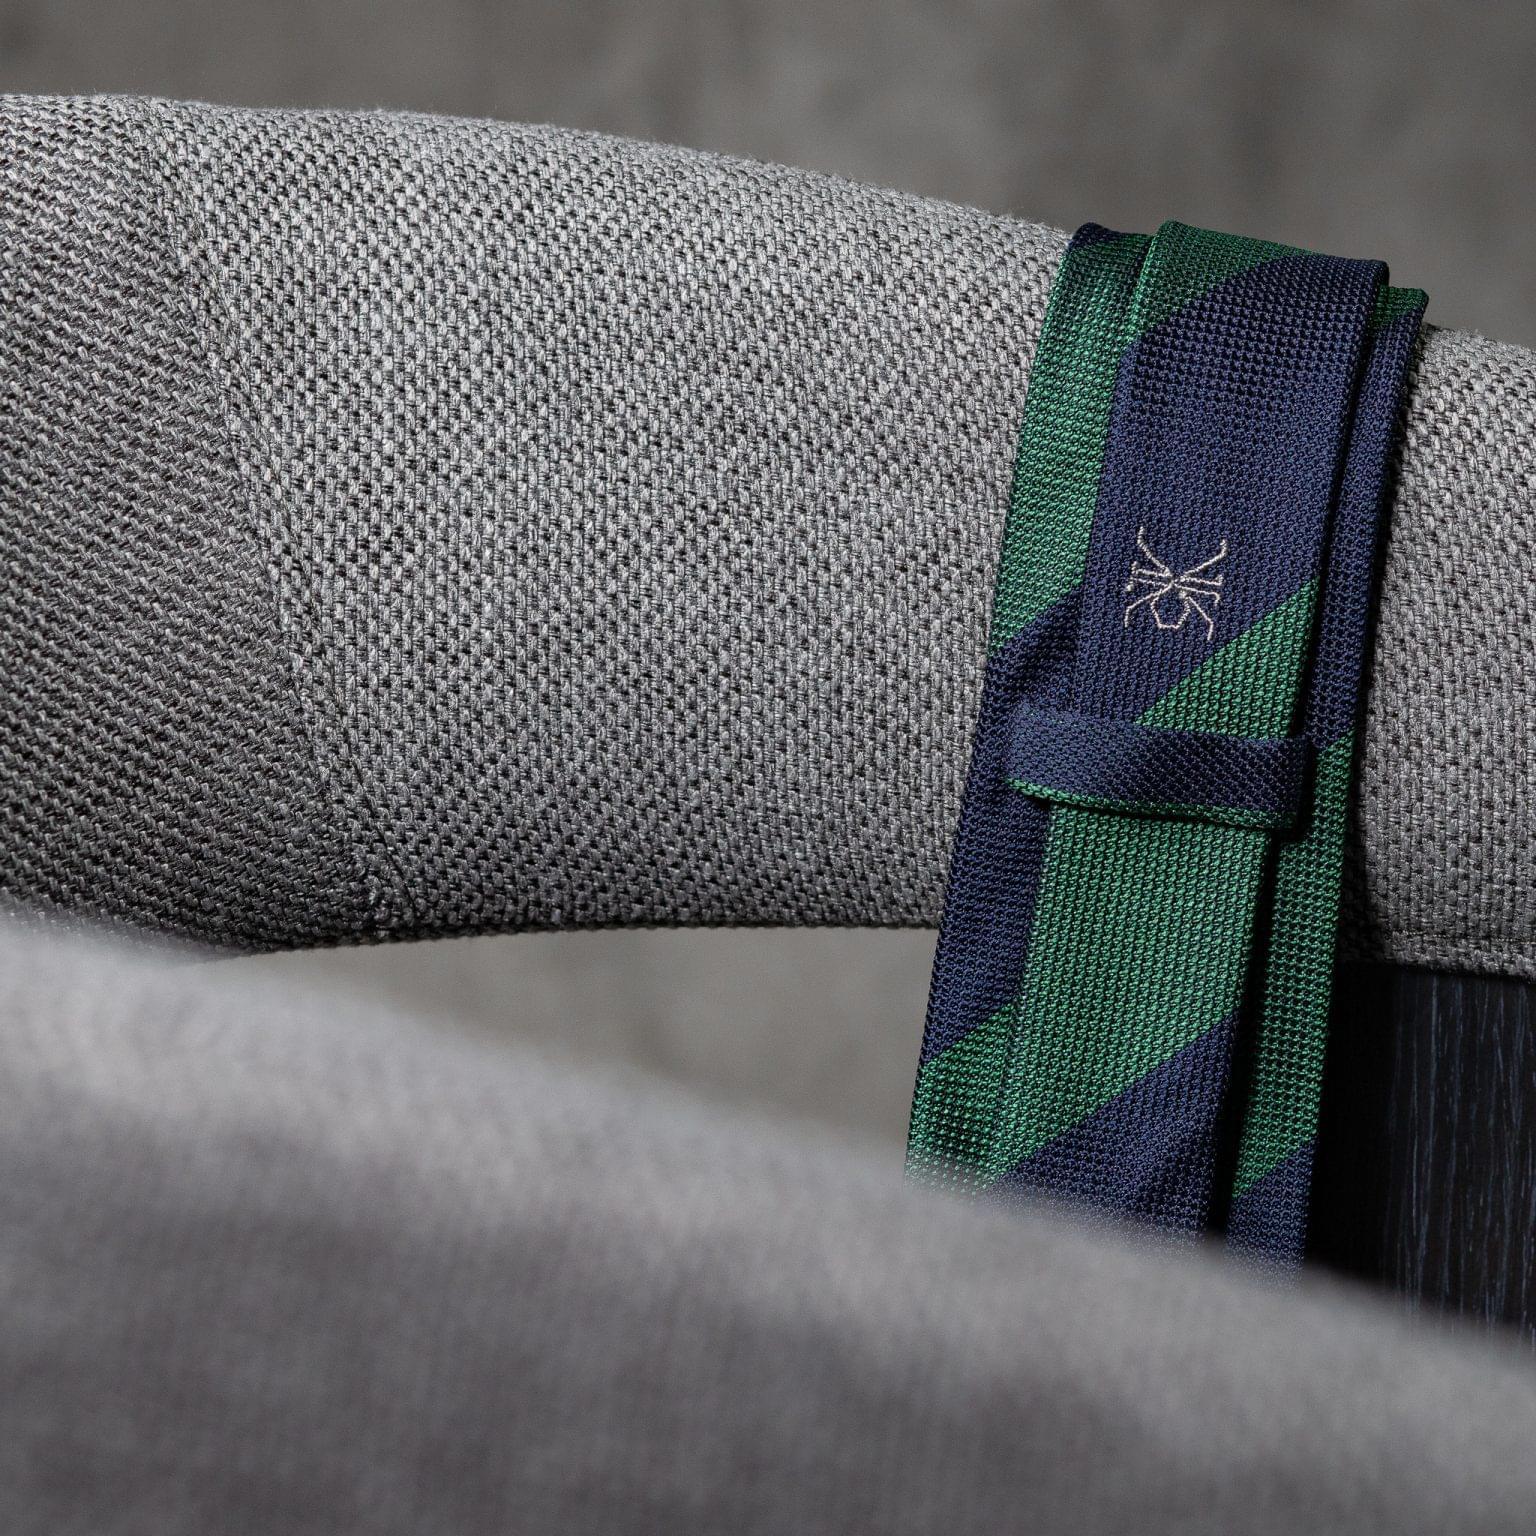 GRENADINE-0523-Tie-Initials-Corbata-Iniciales-The-Seelk-4